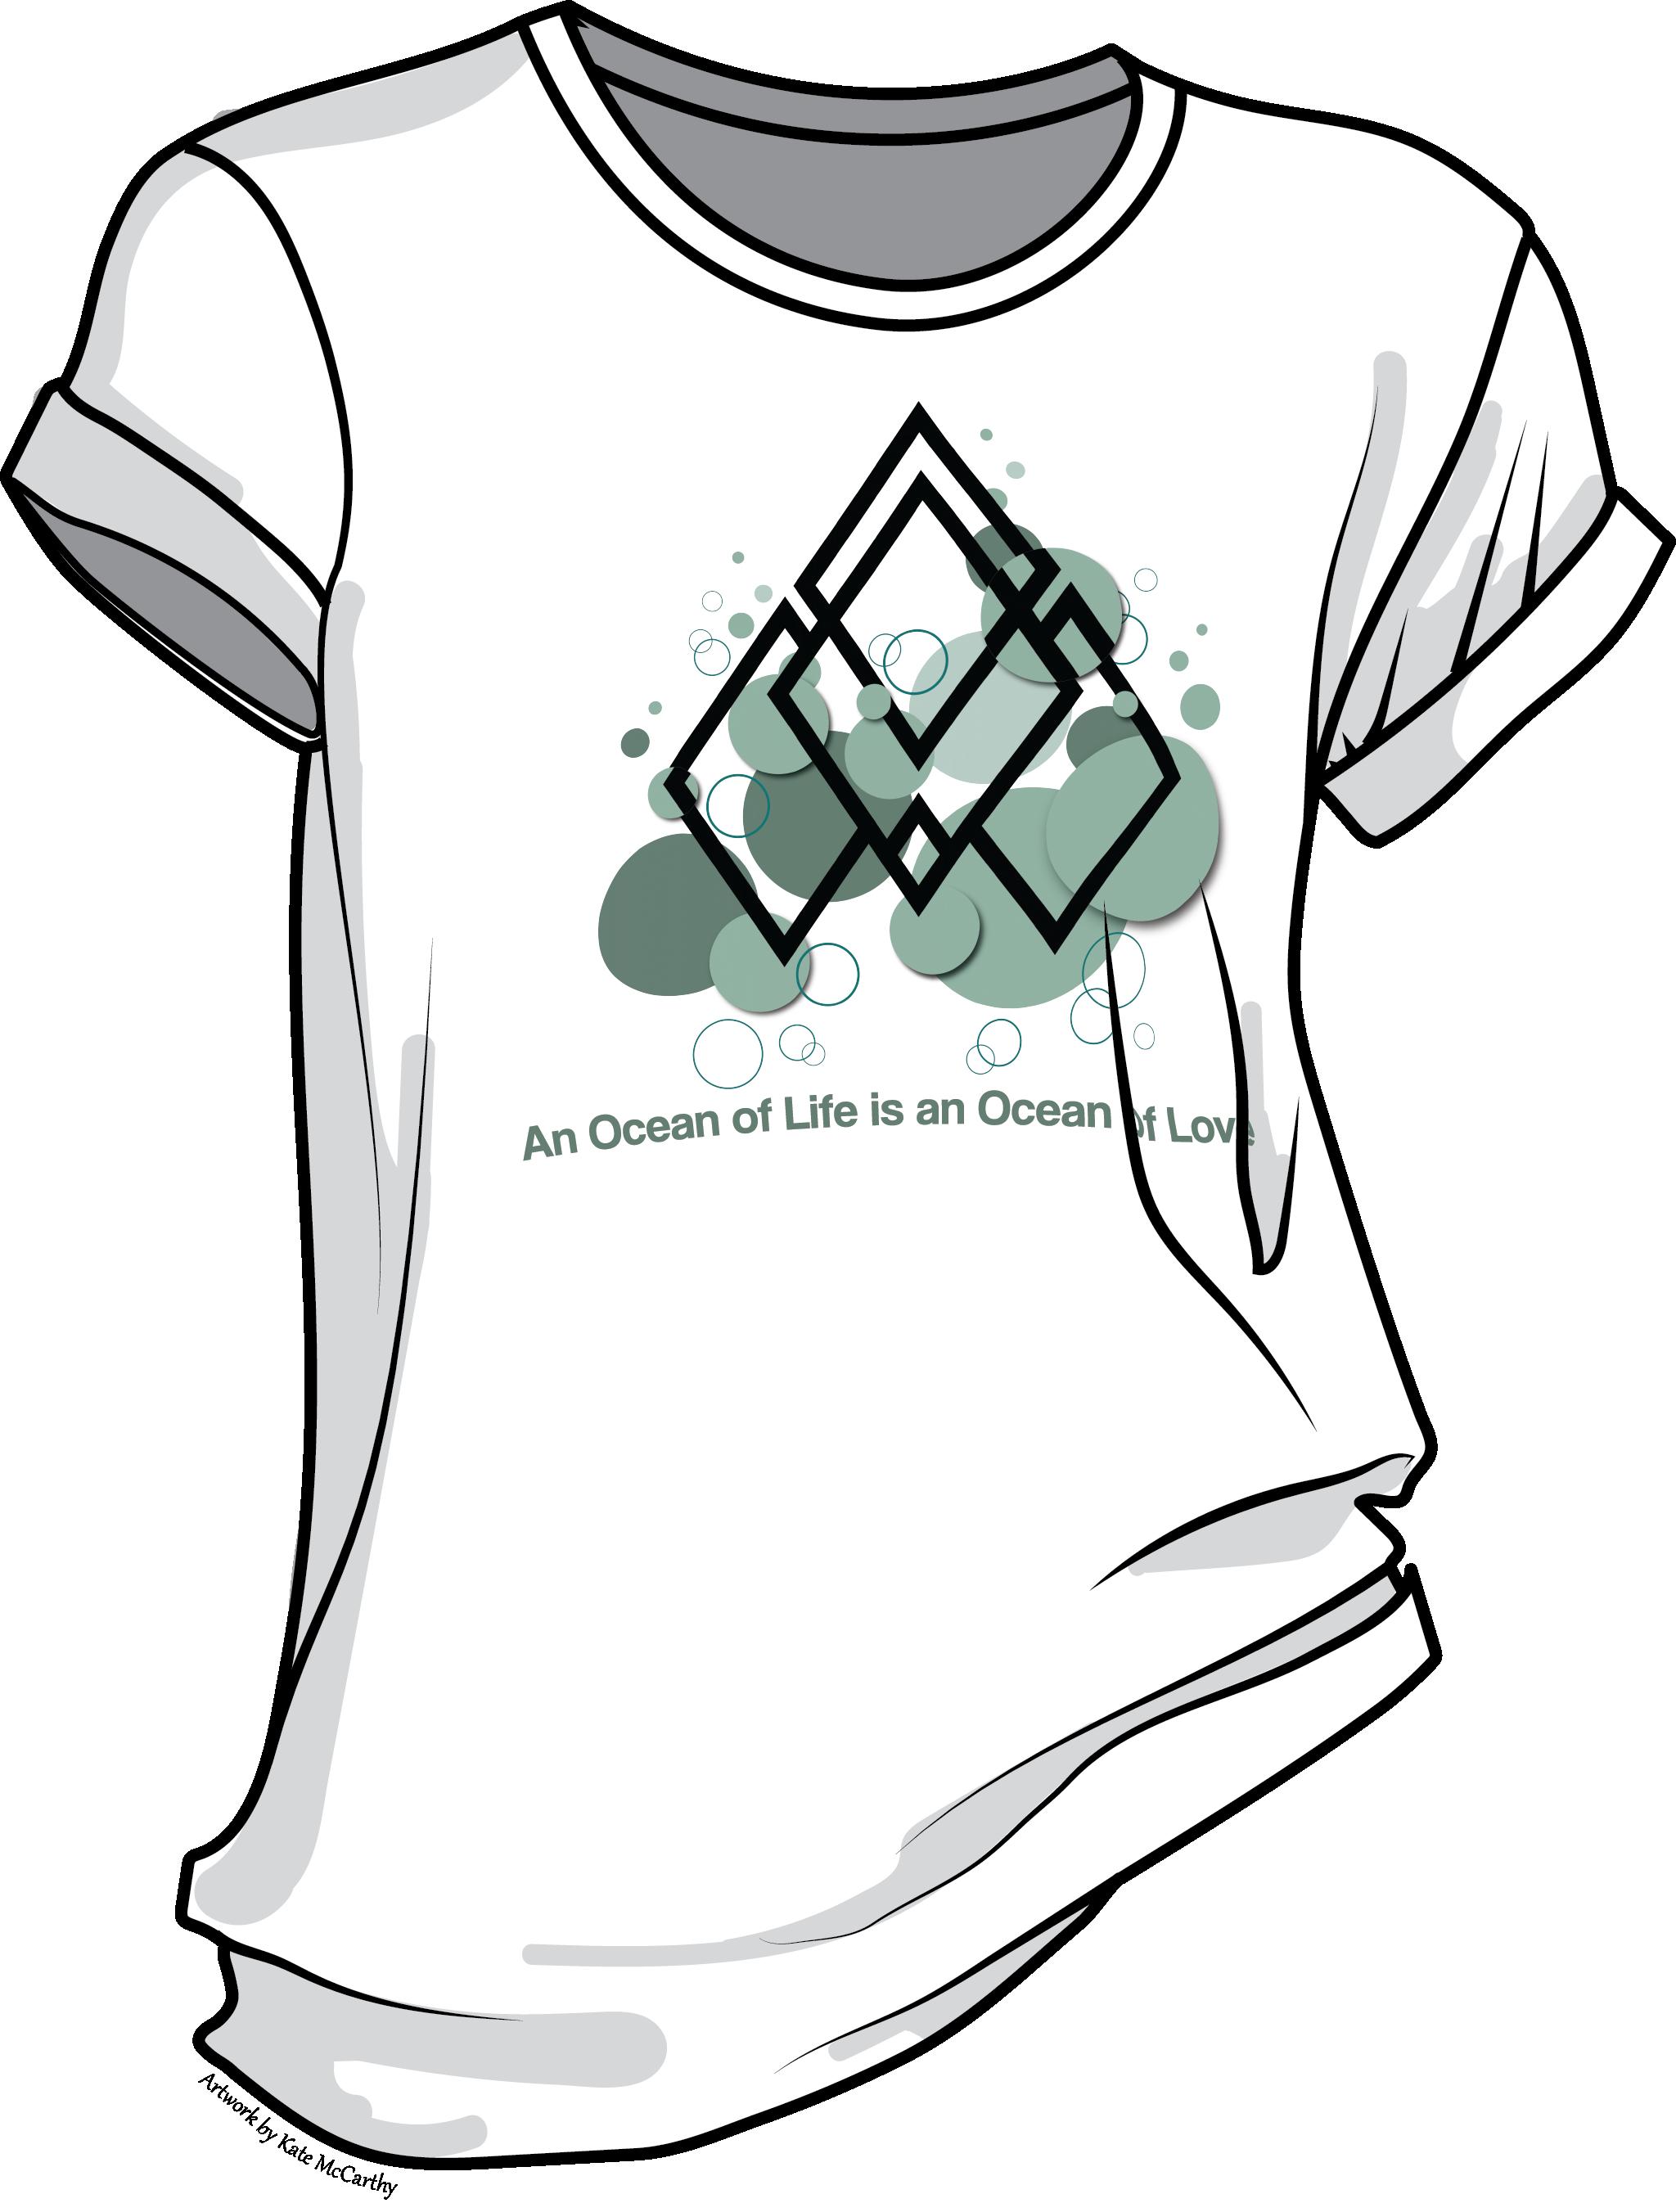 An Ocean of Love Bubbles Graphic T-shirt